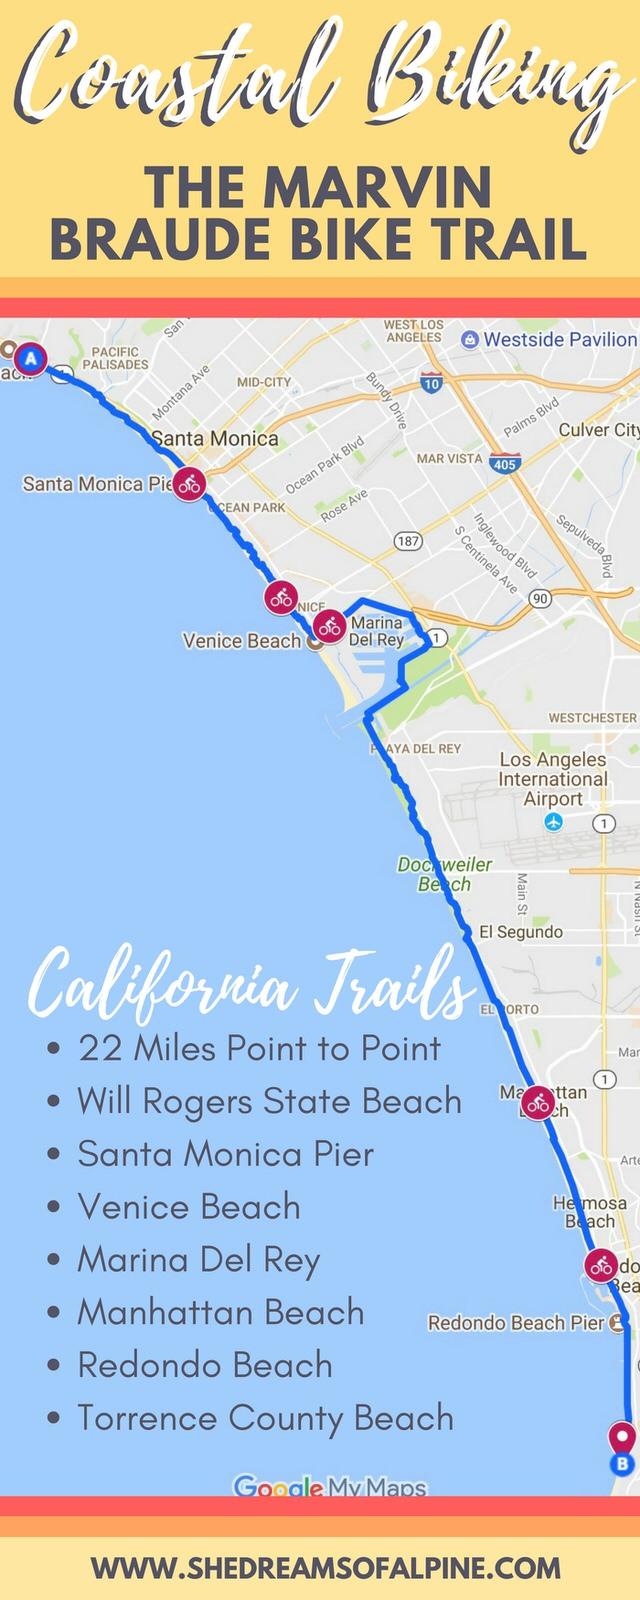 California Coastal Bike Riding - The Marvin Braude Bike Trail